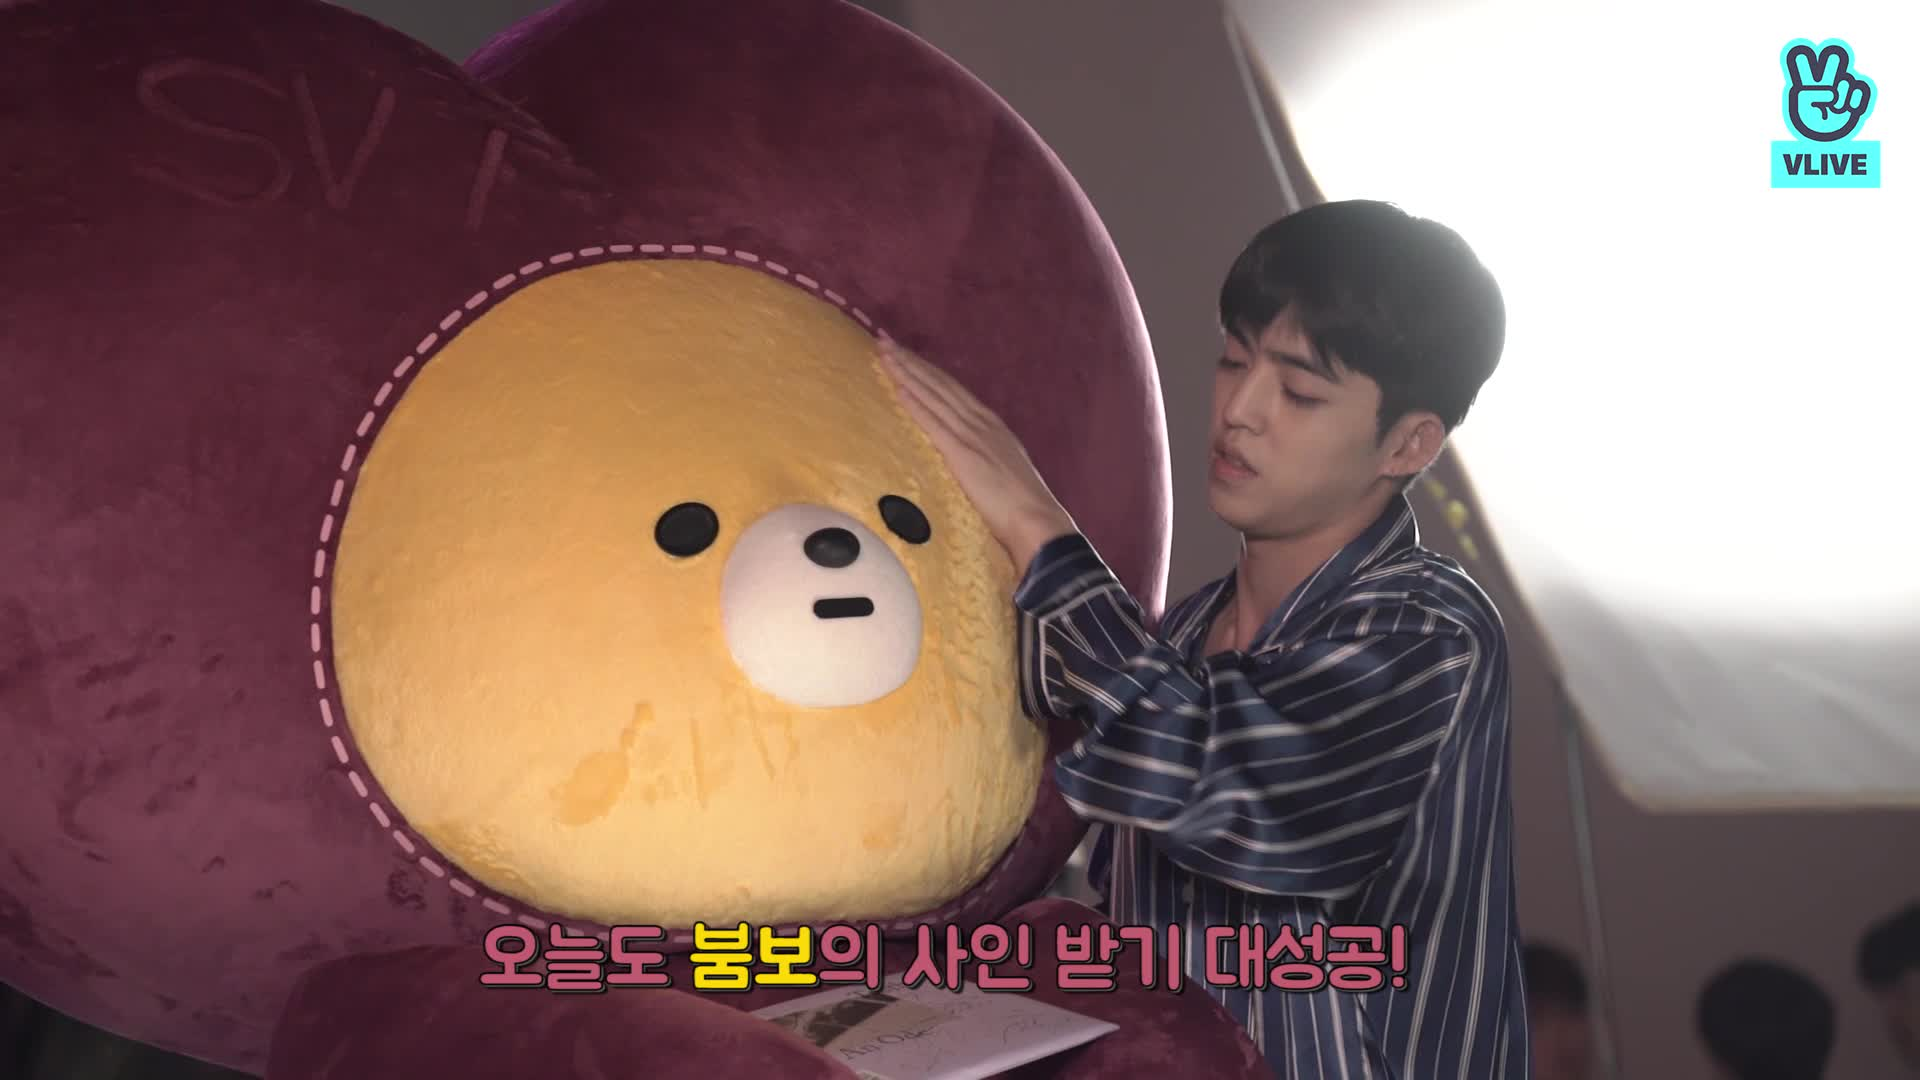 [V CREW] 붐보의 브이로그 - EP. 04 세븐틴 눕방에 찾아가 수줍게 말을 걸어 보았다 (가..가까워..! 🤯)